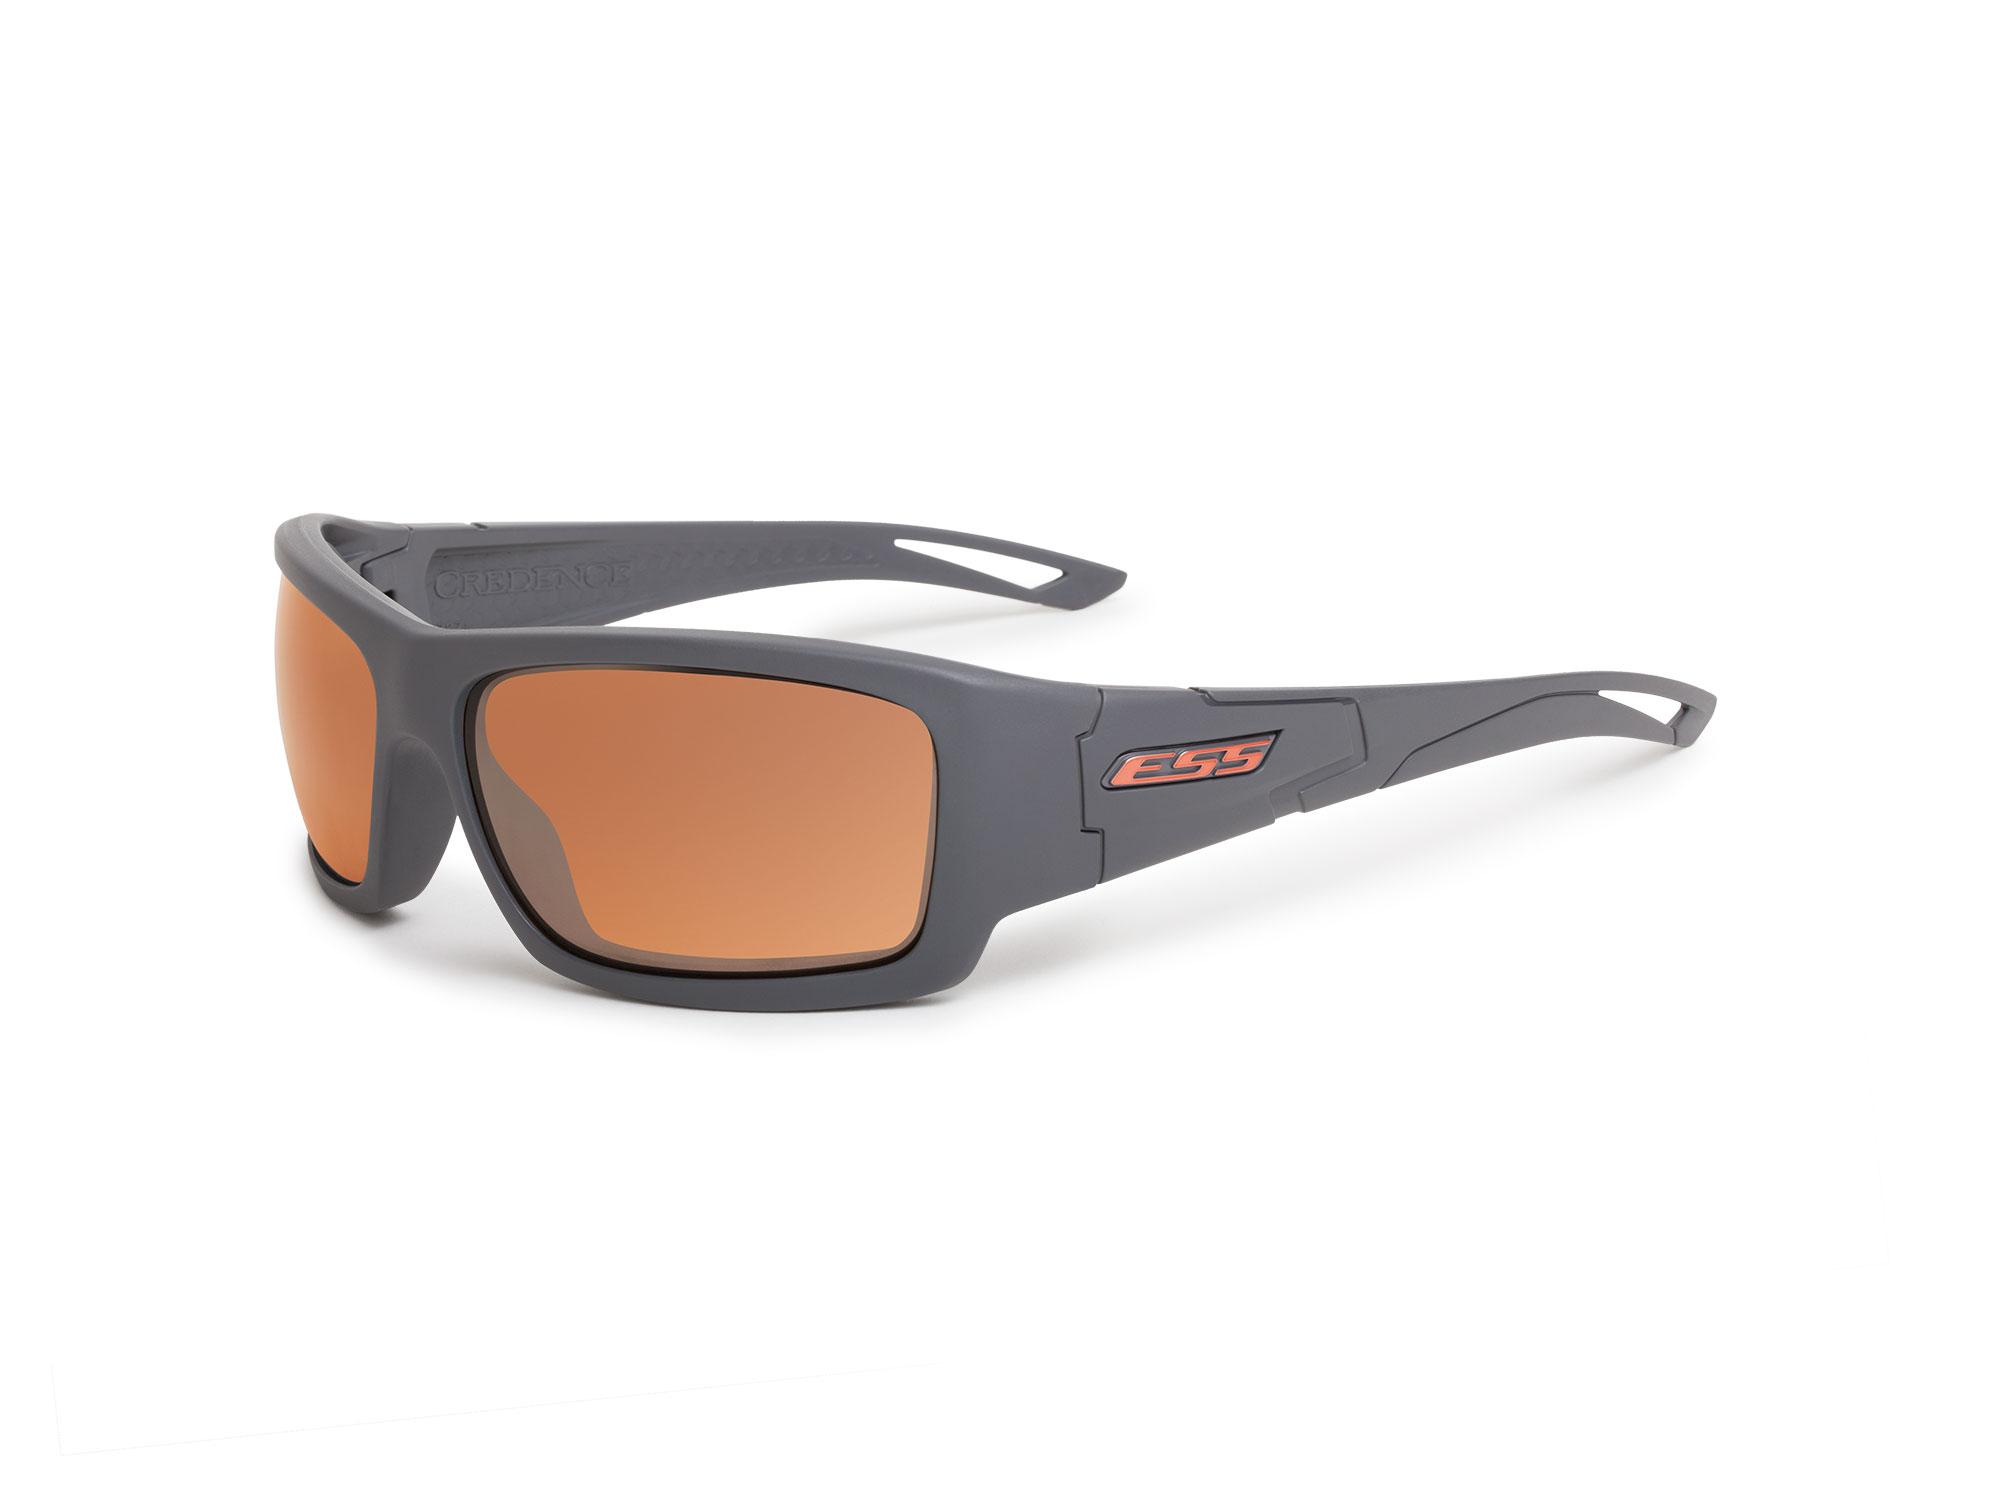 EE9015-02フレーム:グレイ、レンズ:ミラーコッパー